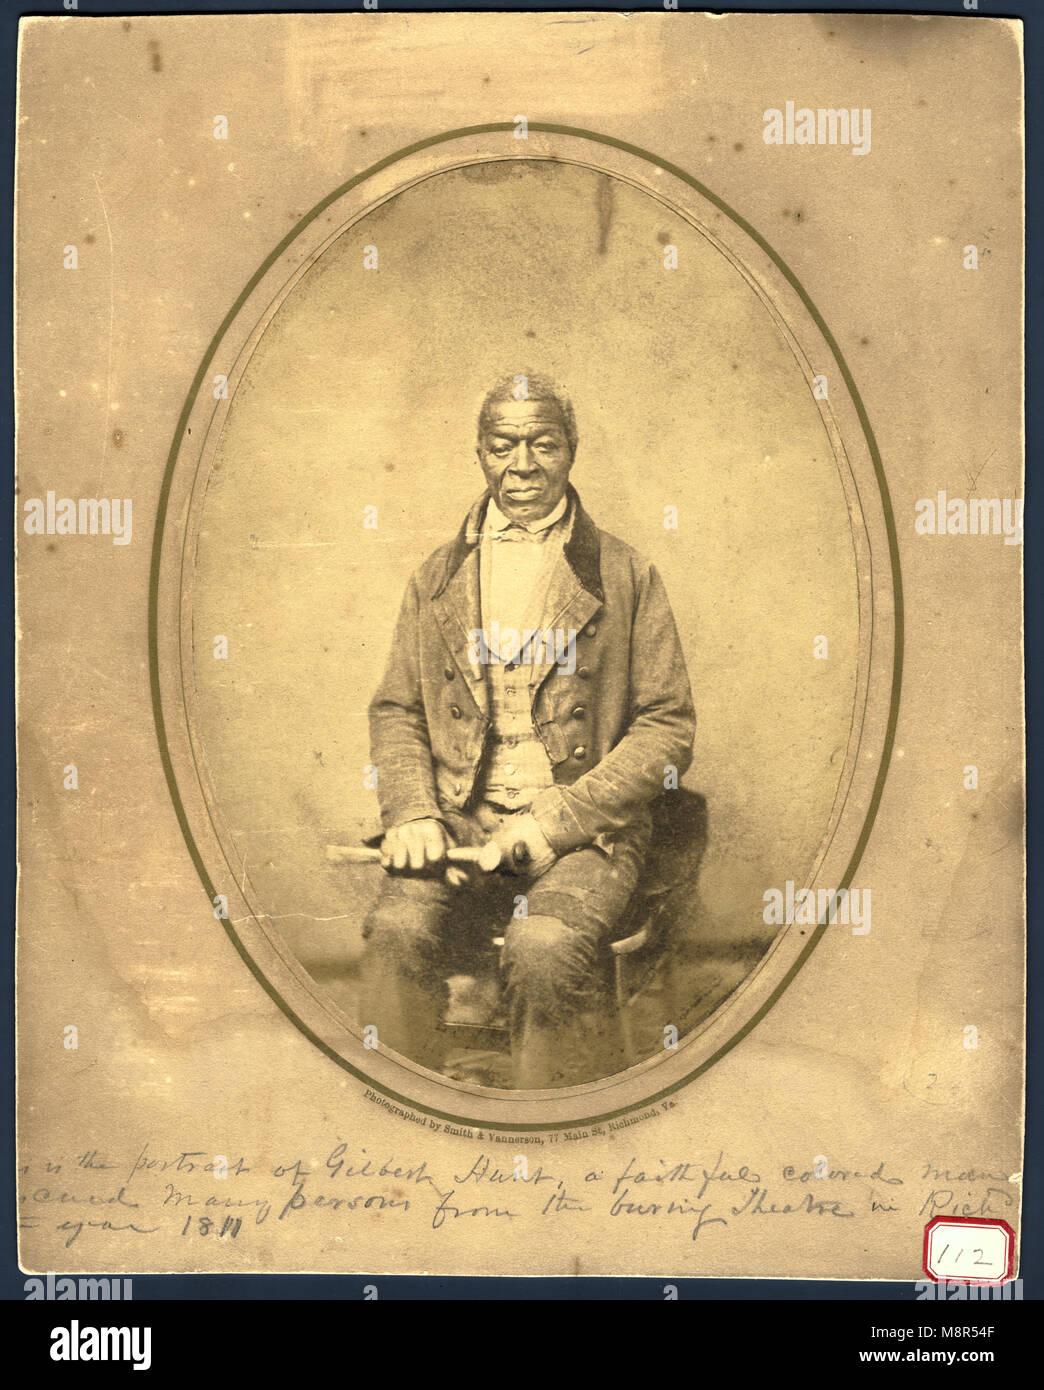 Gilbert Hunt, Hero of the Richmond Theatre Fire, 1811 - Stock Image